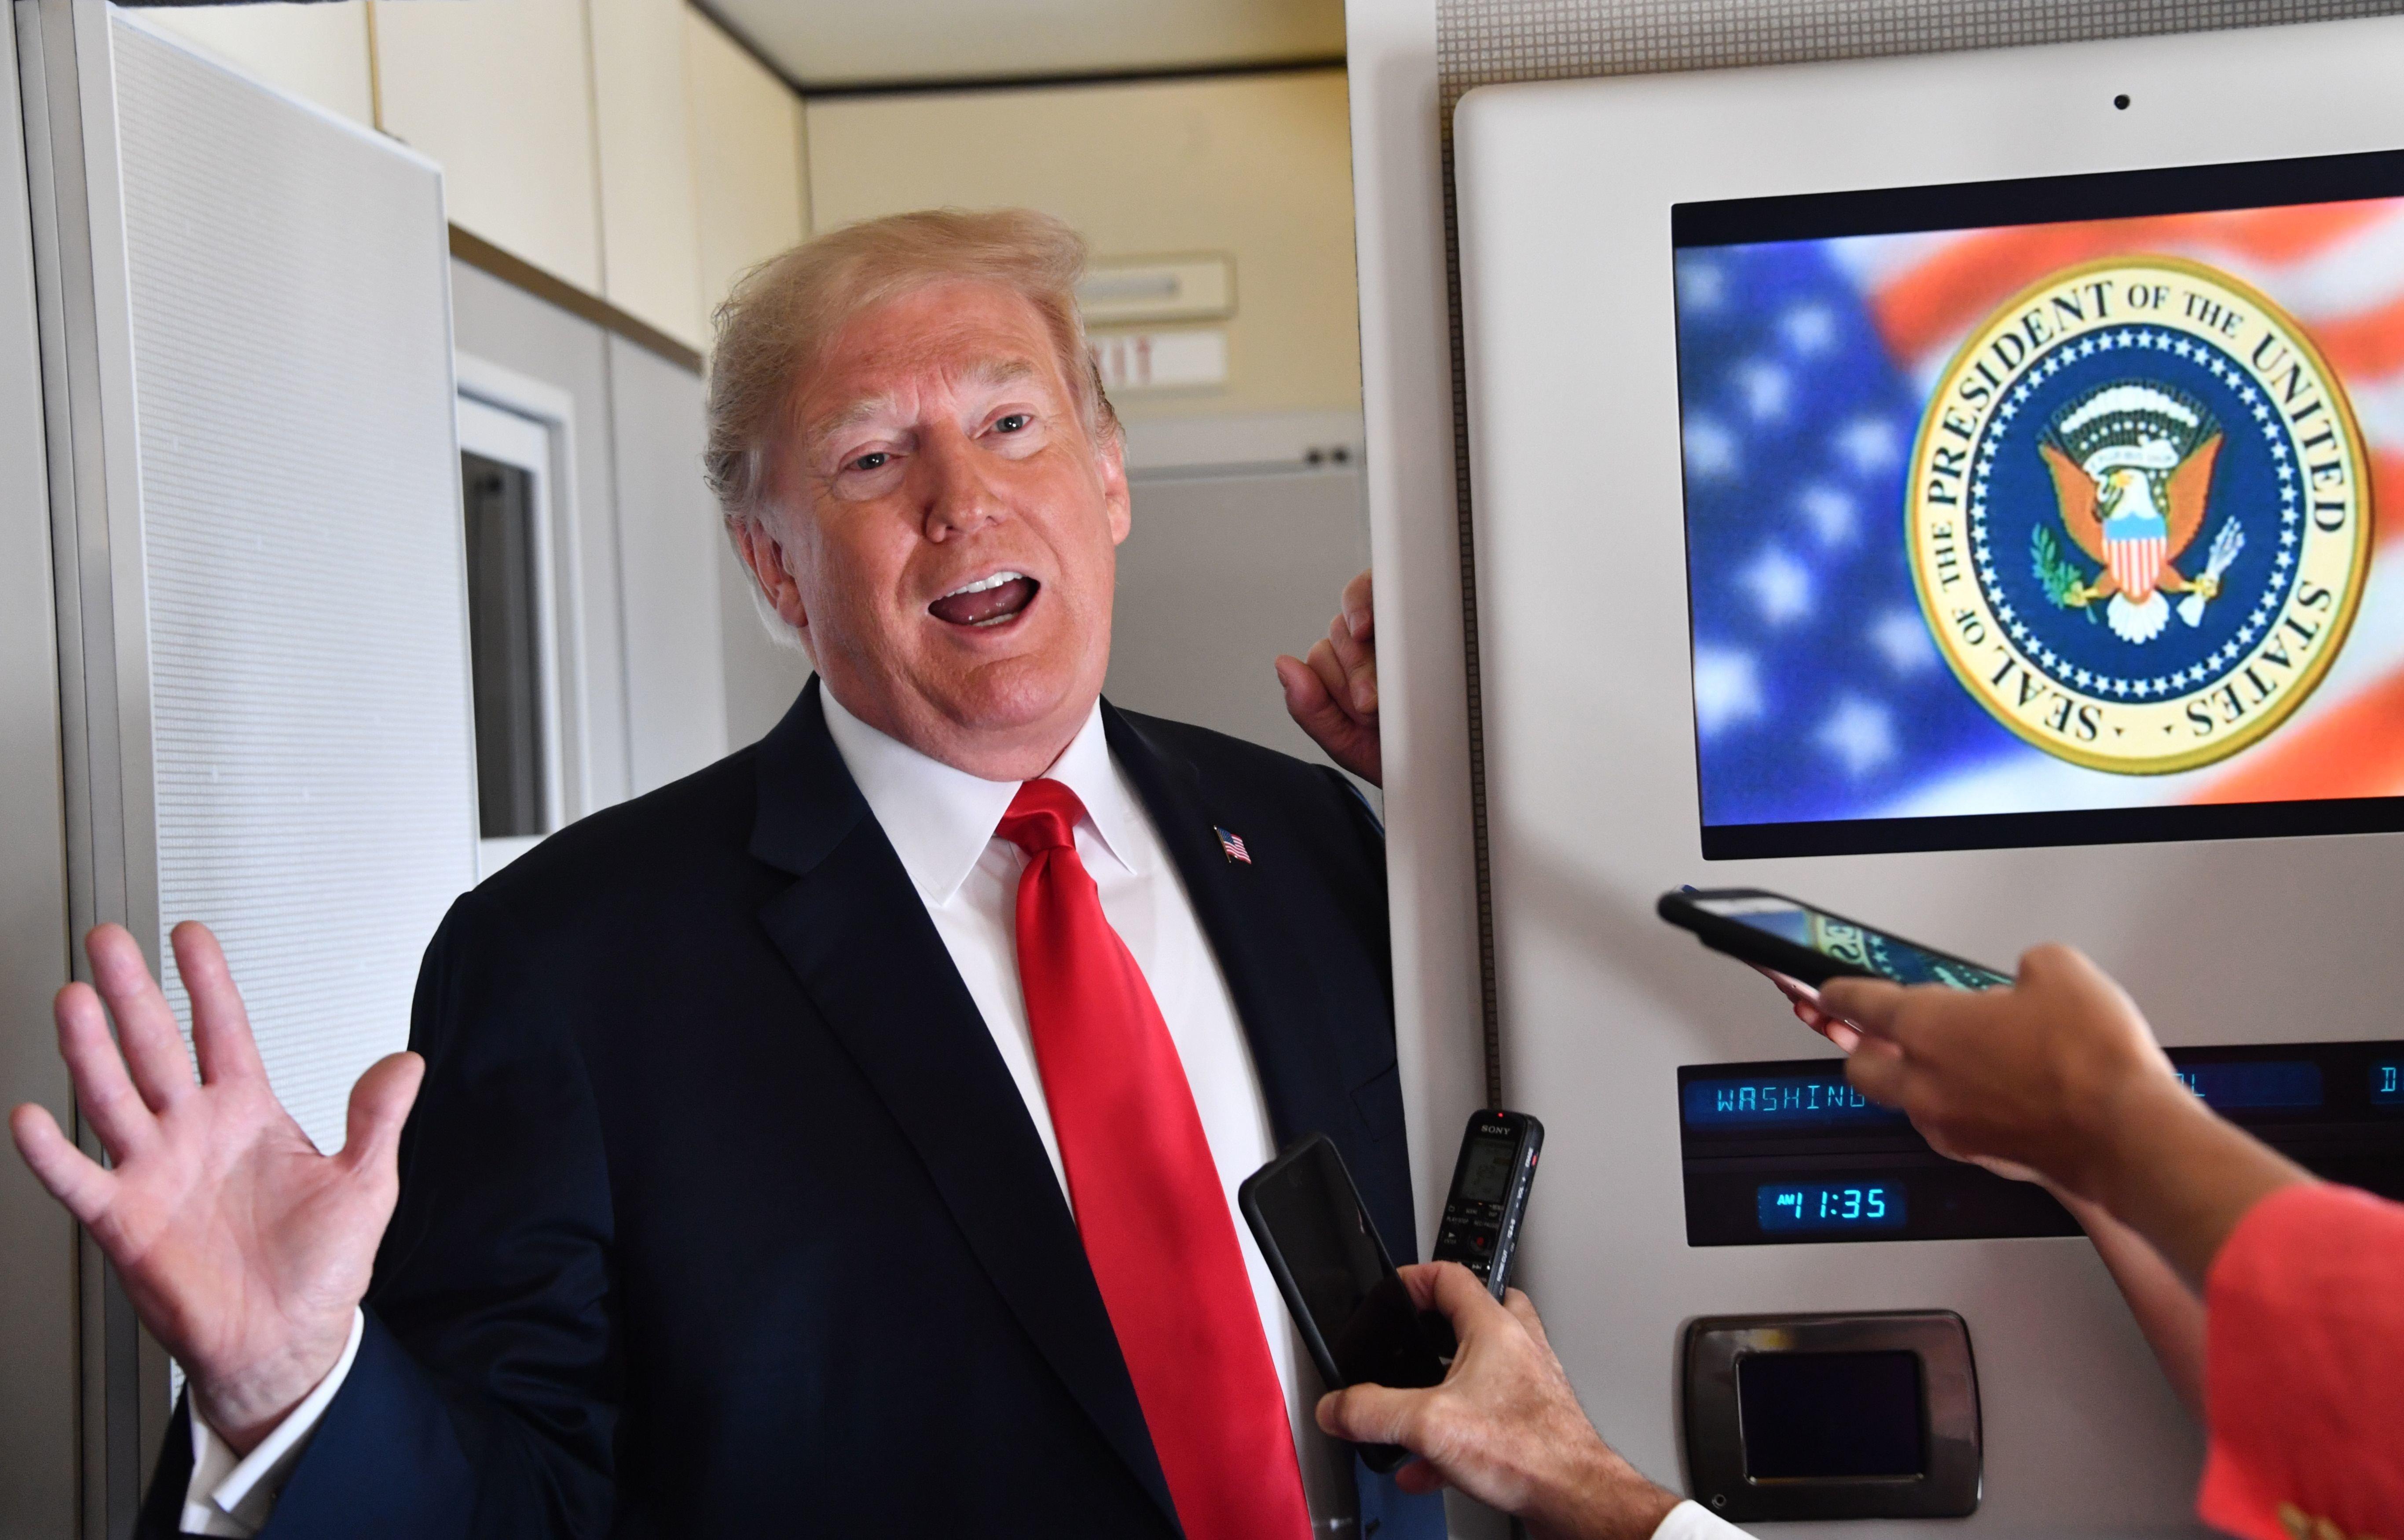 Irish Government Says Trump's Ireland Visit Has Been